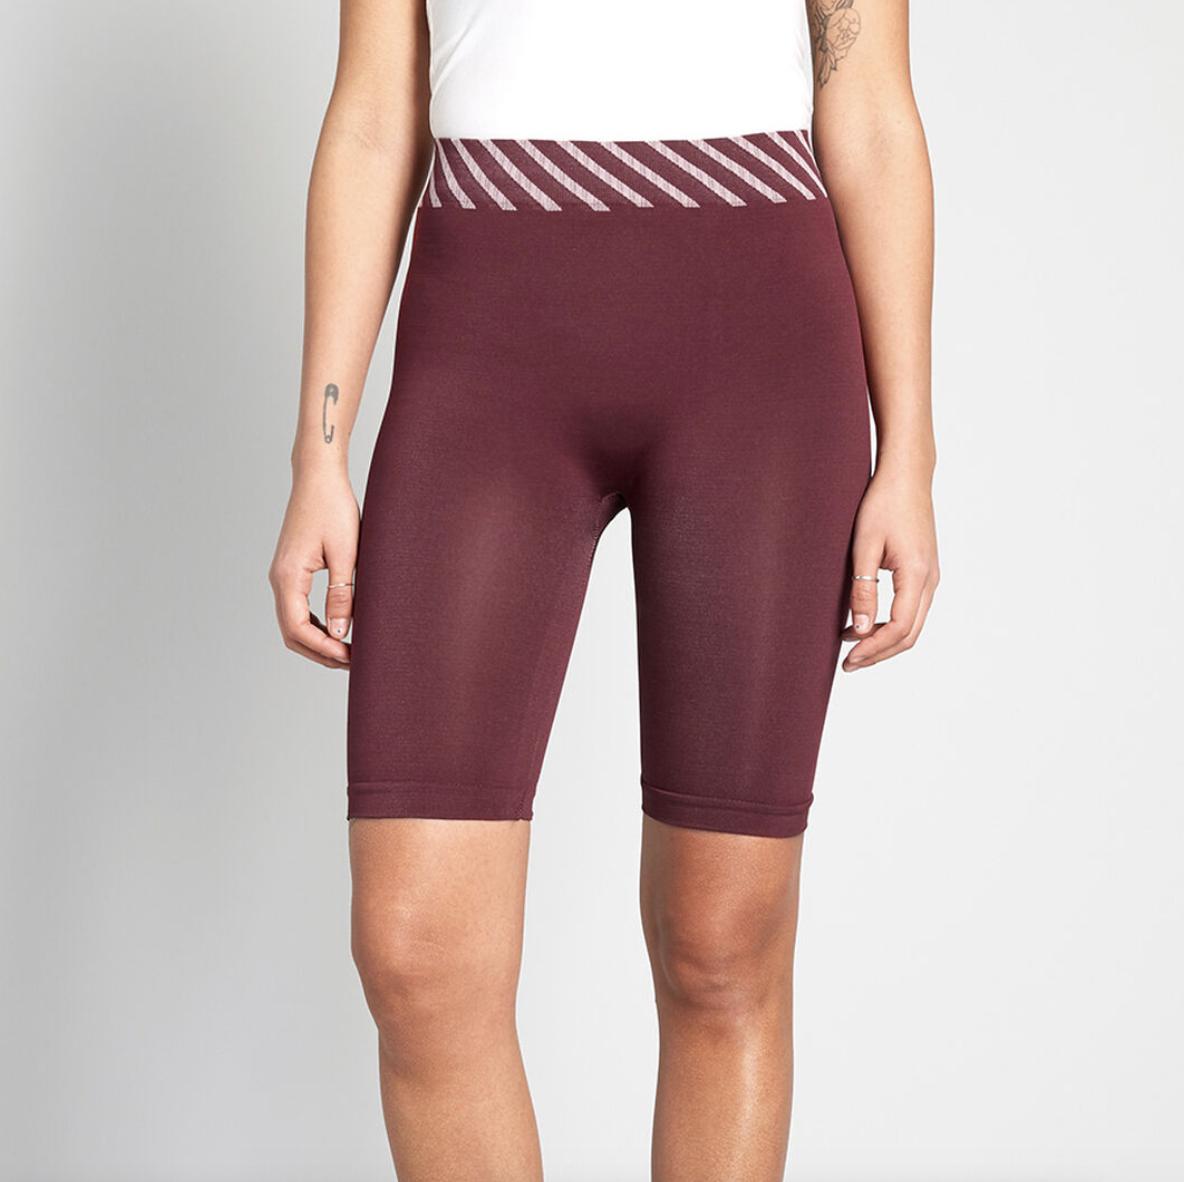 a model wearing the maroon stretchy bike shorts